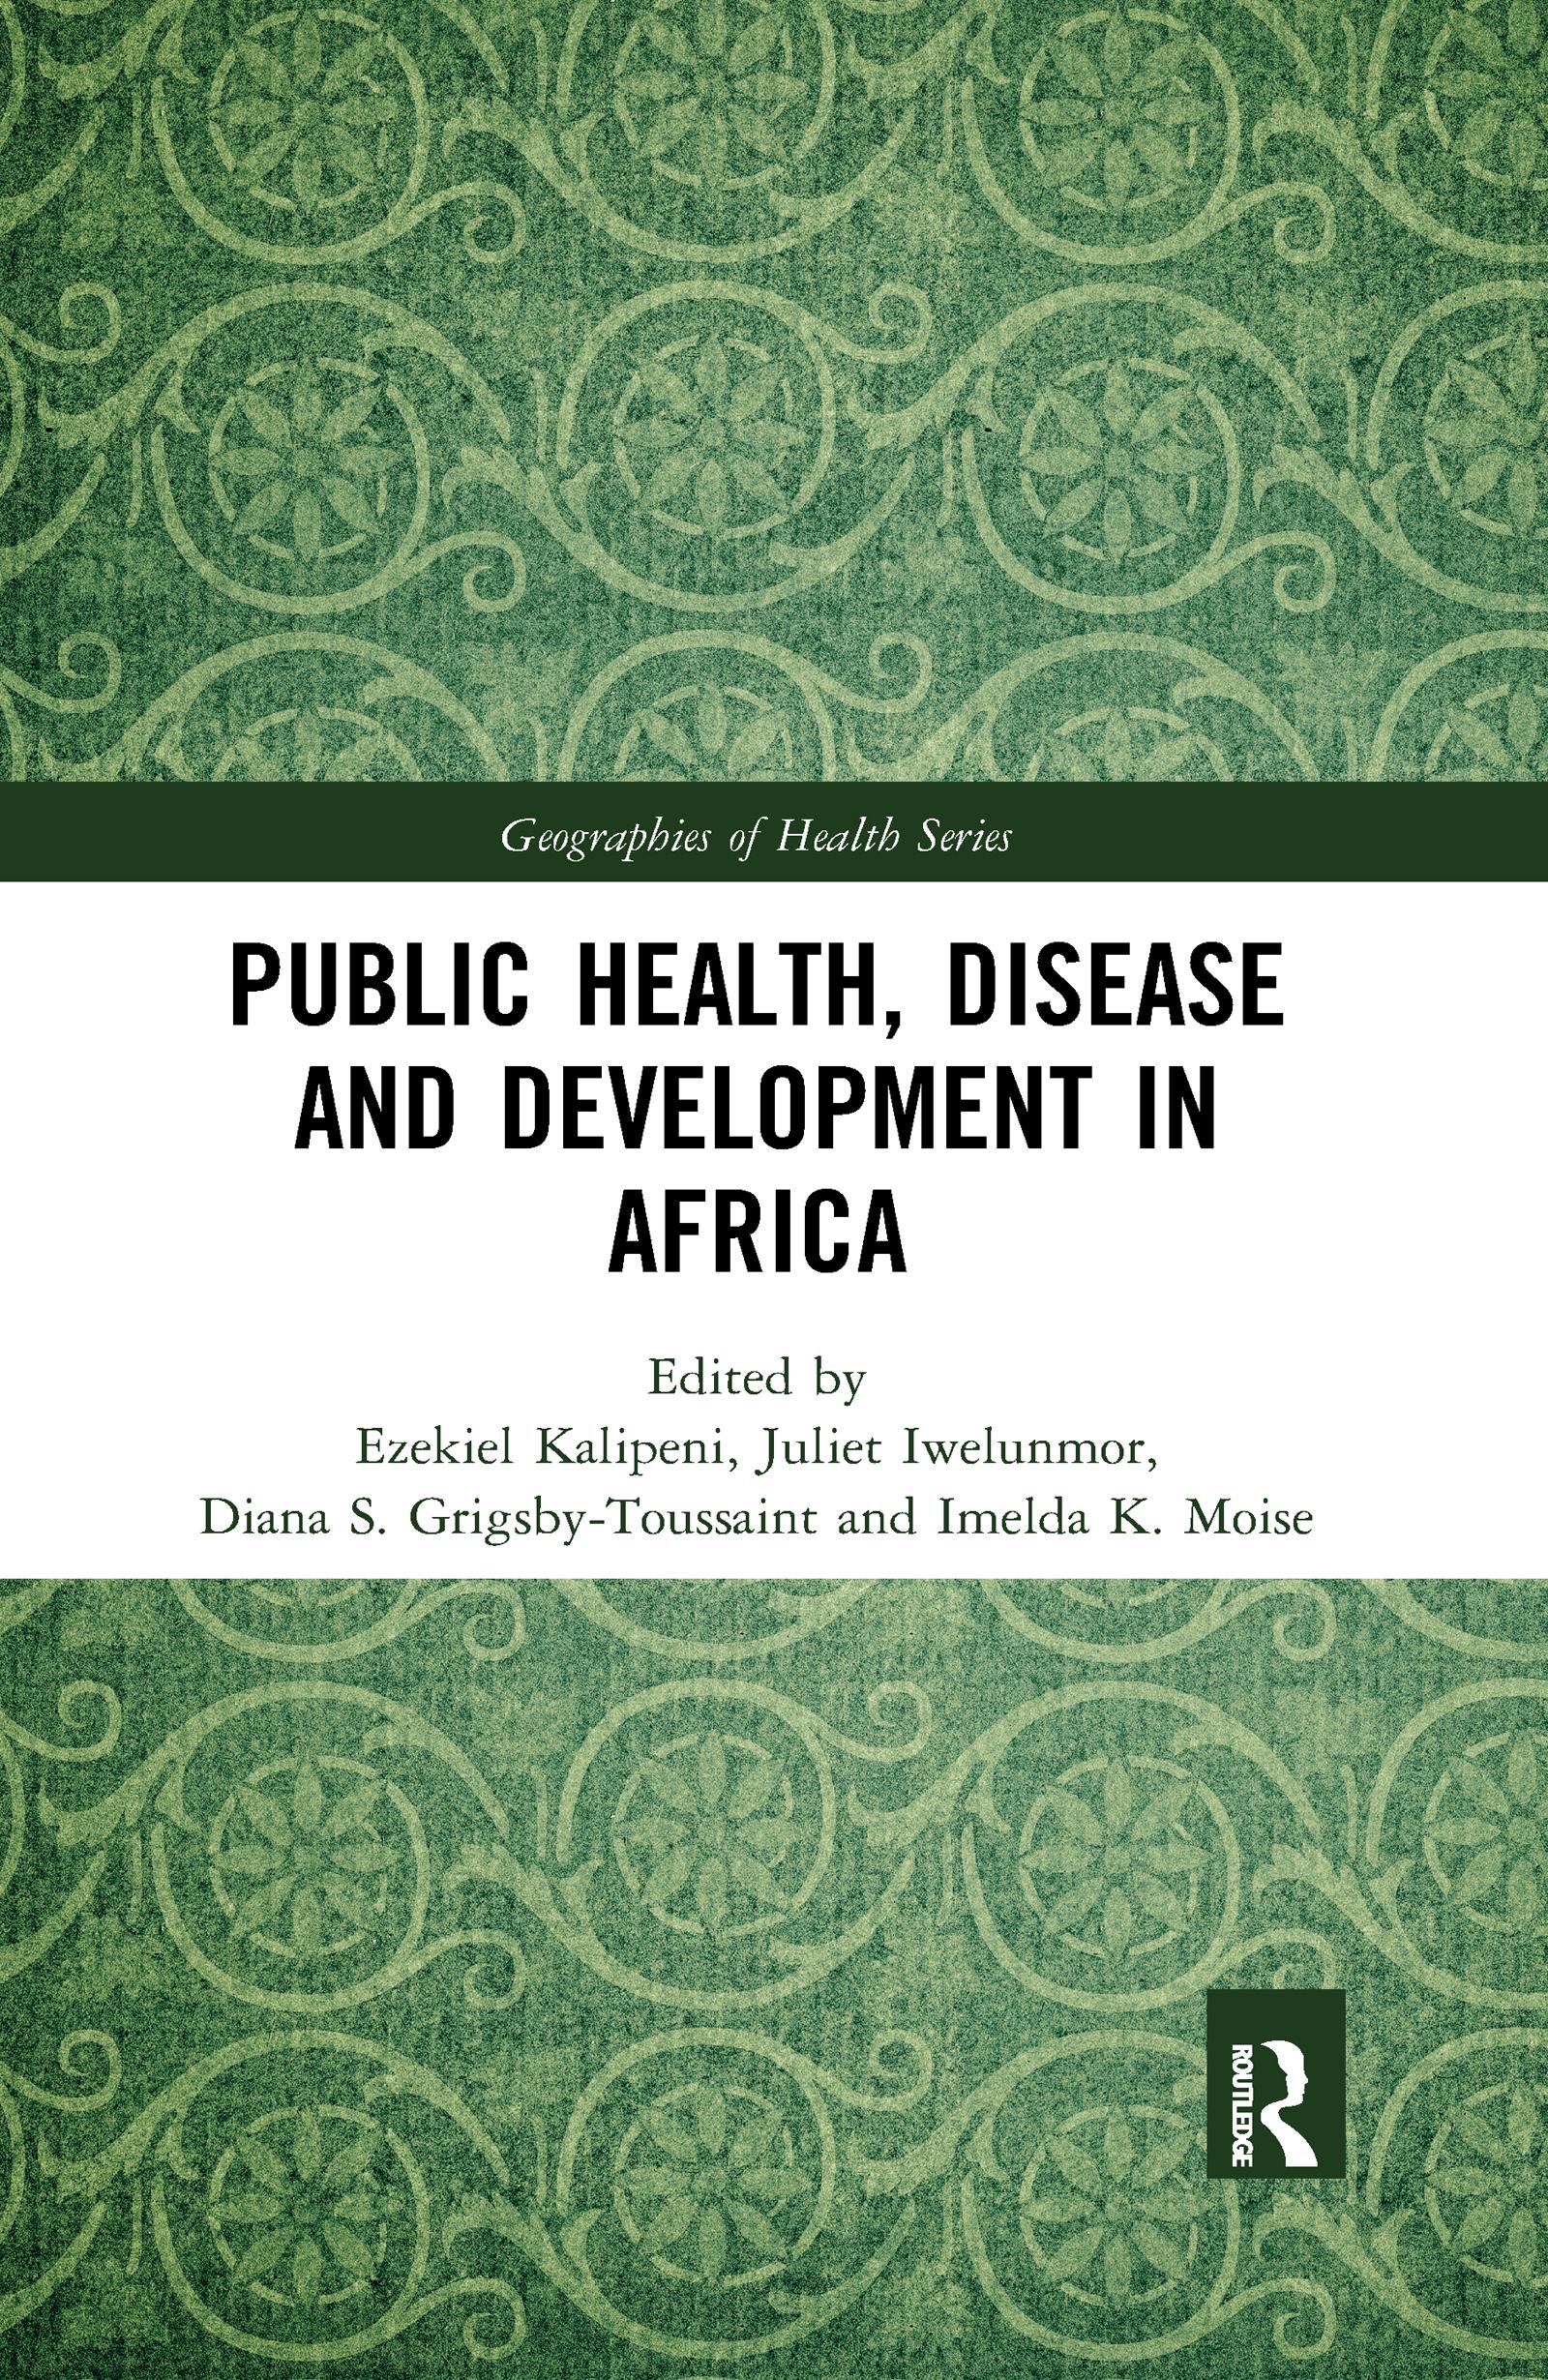 Public Health, Disease and Development in Africa